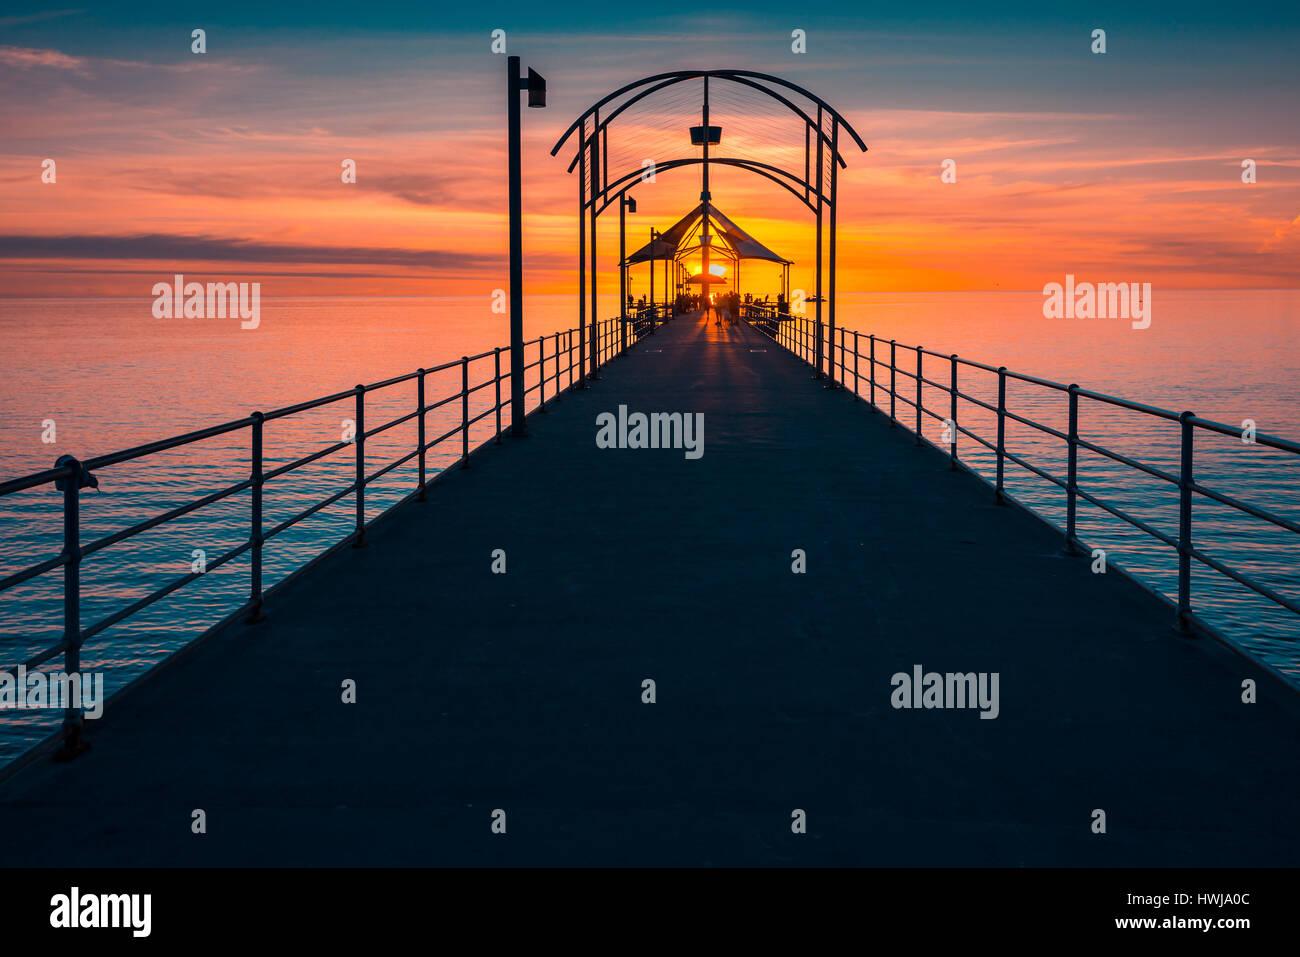 People walking along Brighton Jetty at sunset - Stock Image